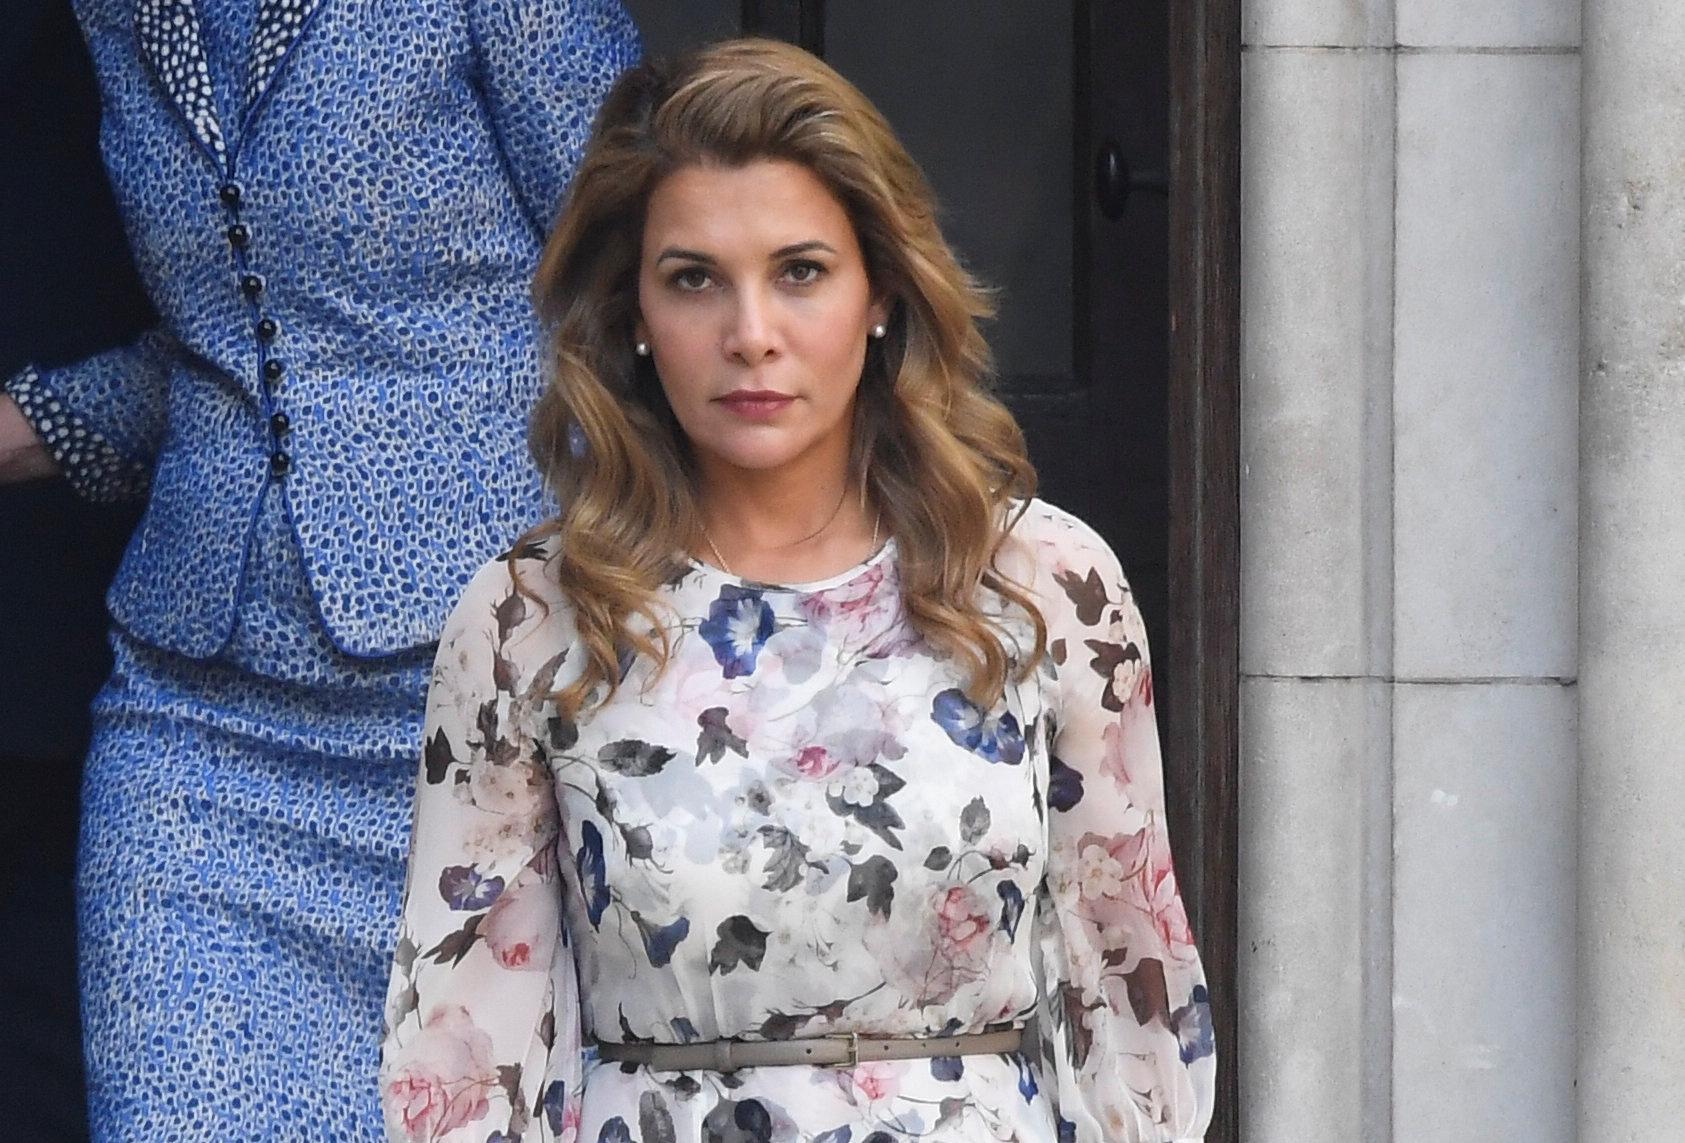 UK court sets November hearing for case of Dubai ruler and princess